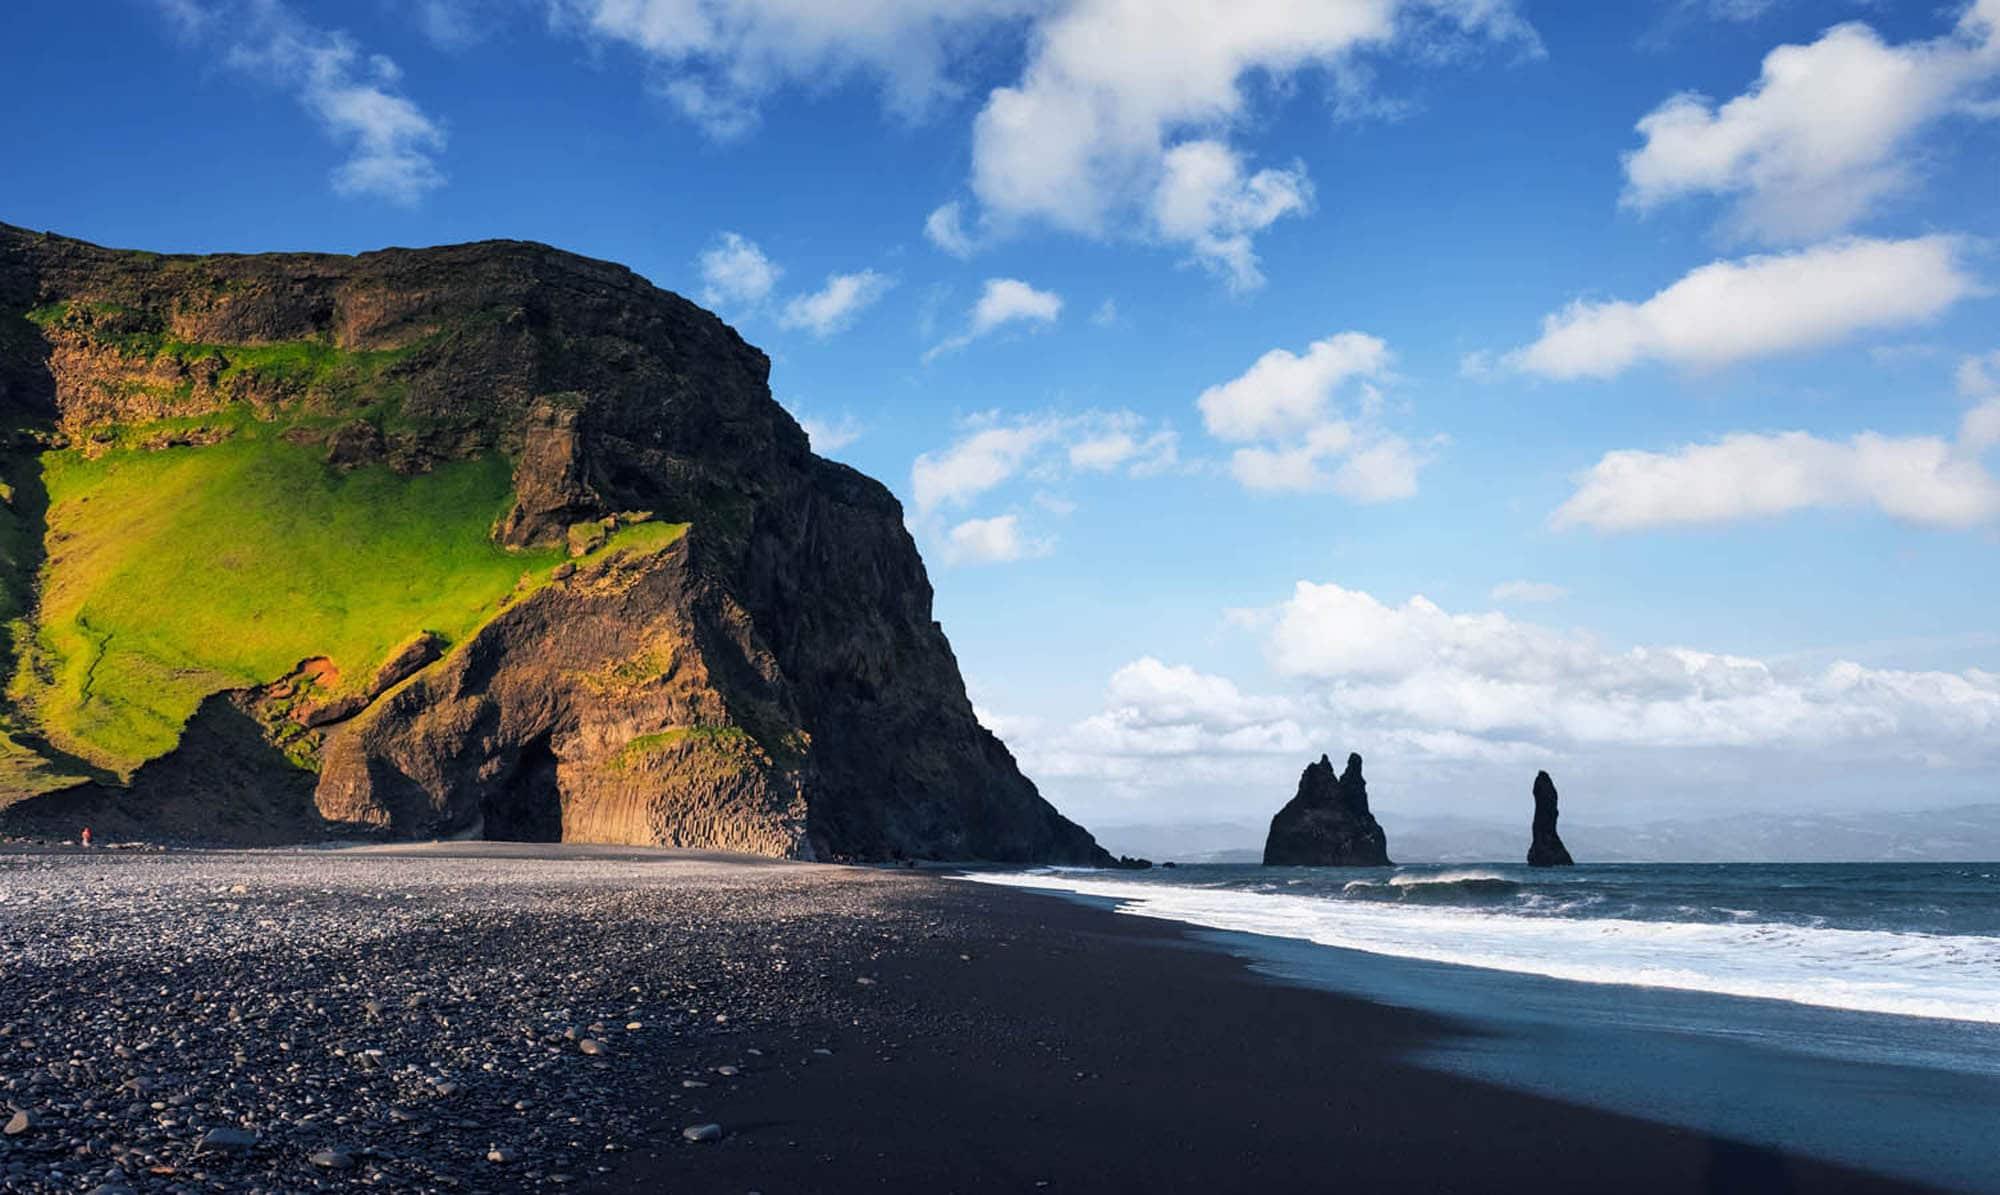 Reynisfjara - The black beaches of Vik